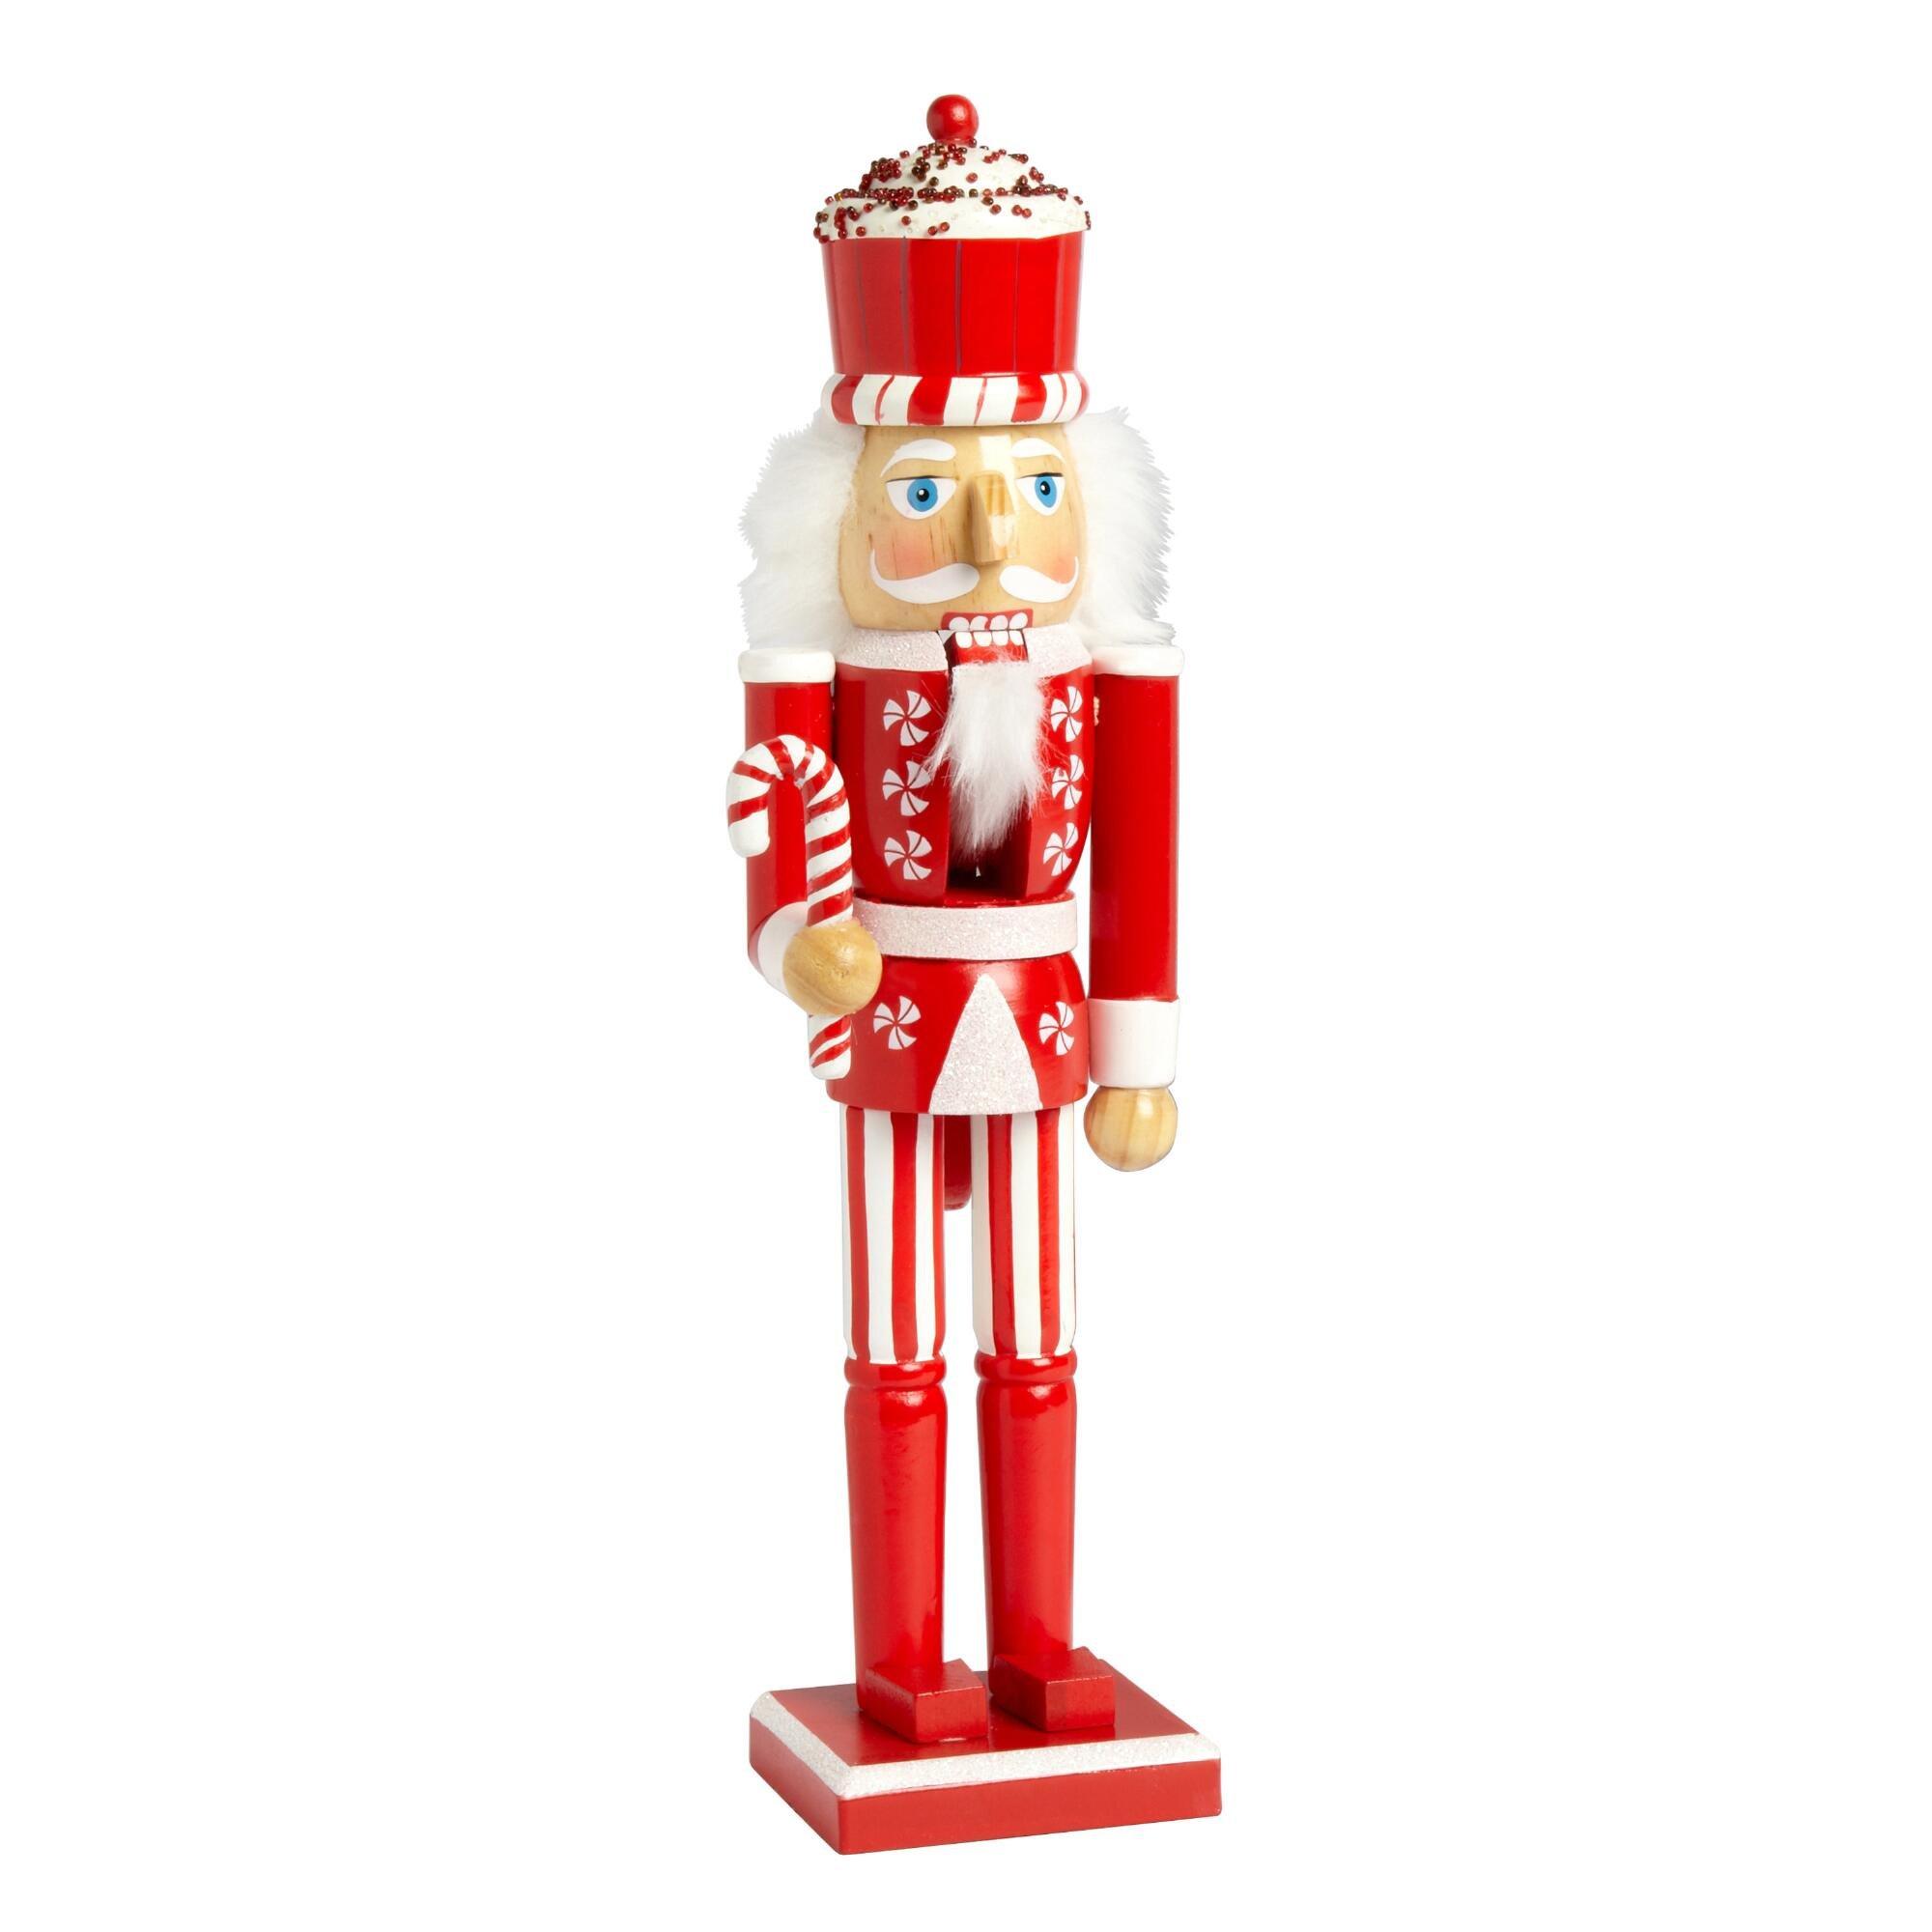 Nantucket Home Wooden Christmas Nutcracker Decor, 15-Inch (Peppermint Cupcake Soldier)